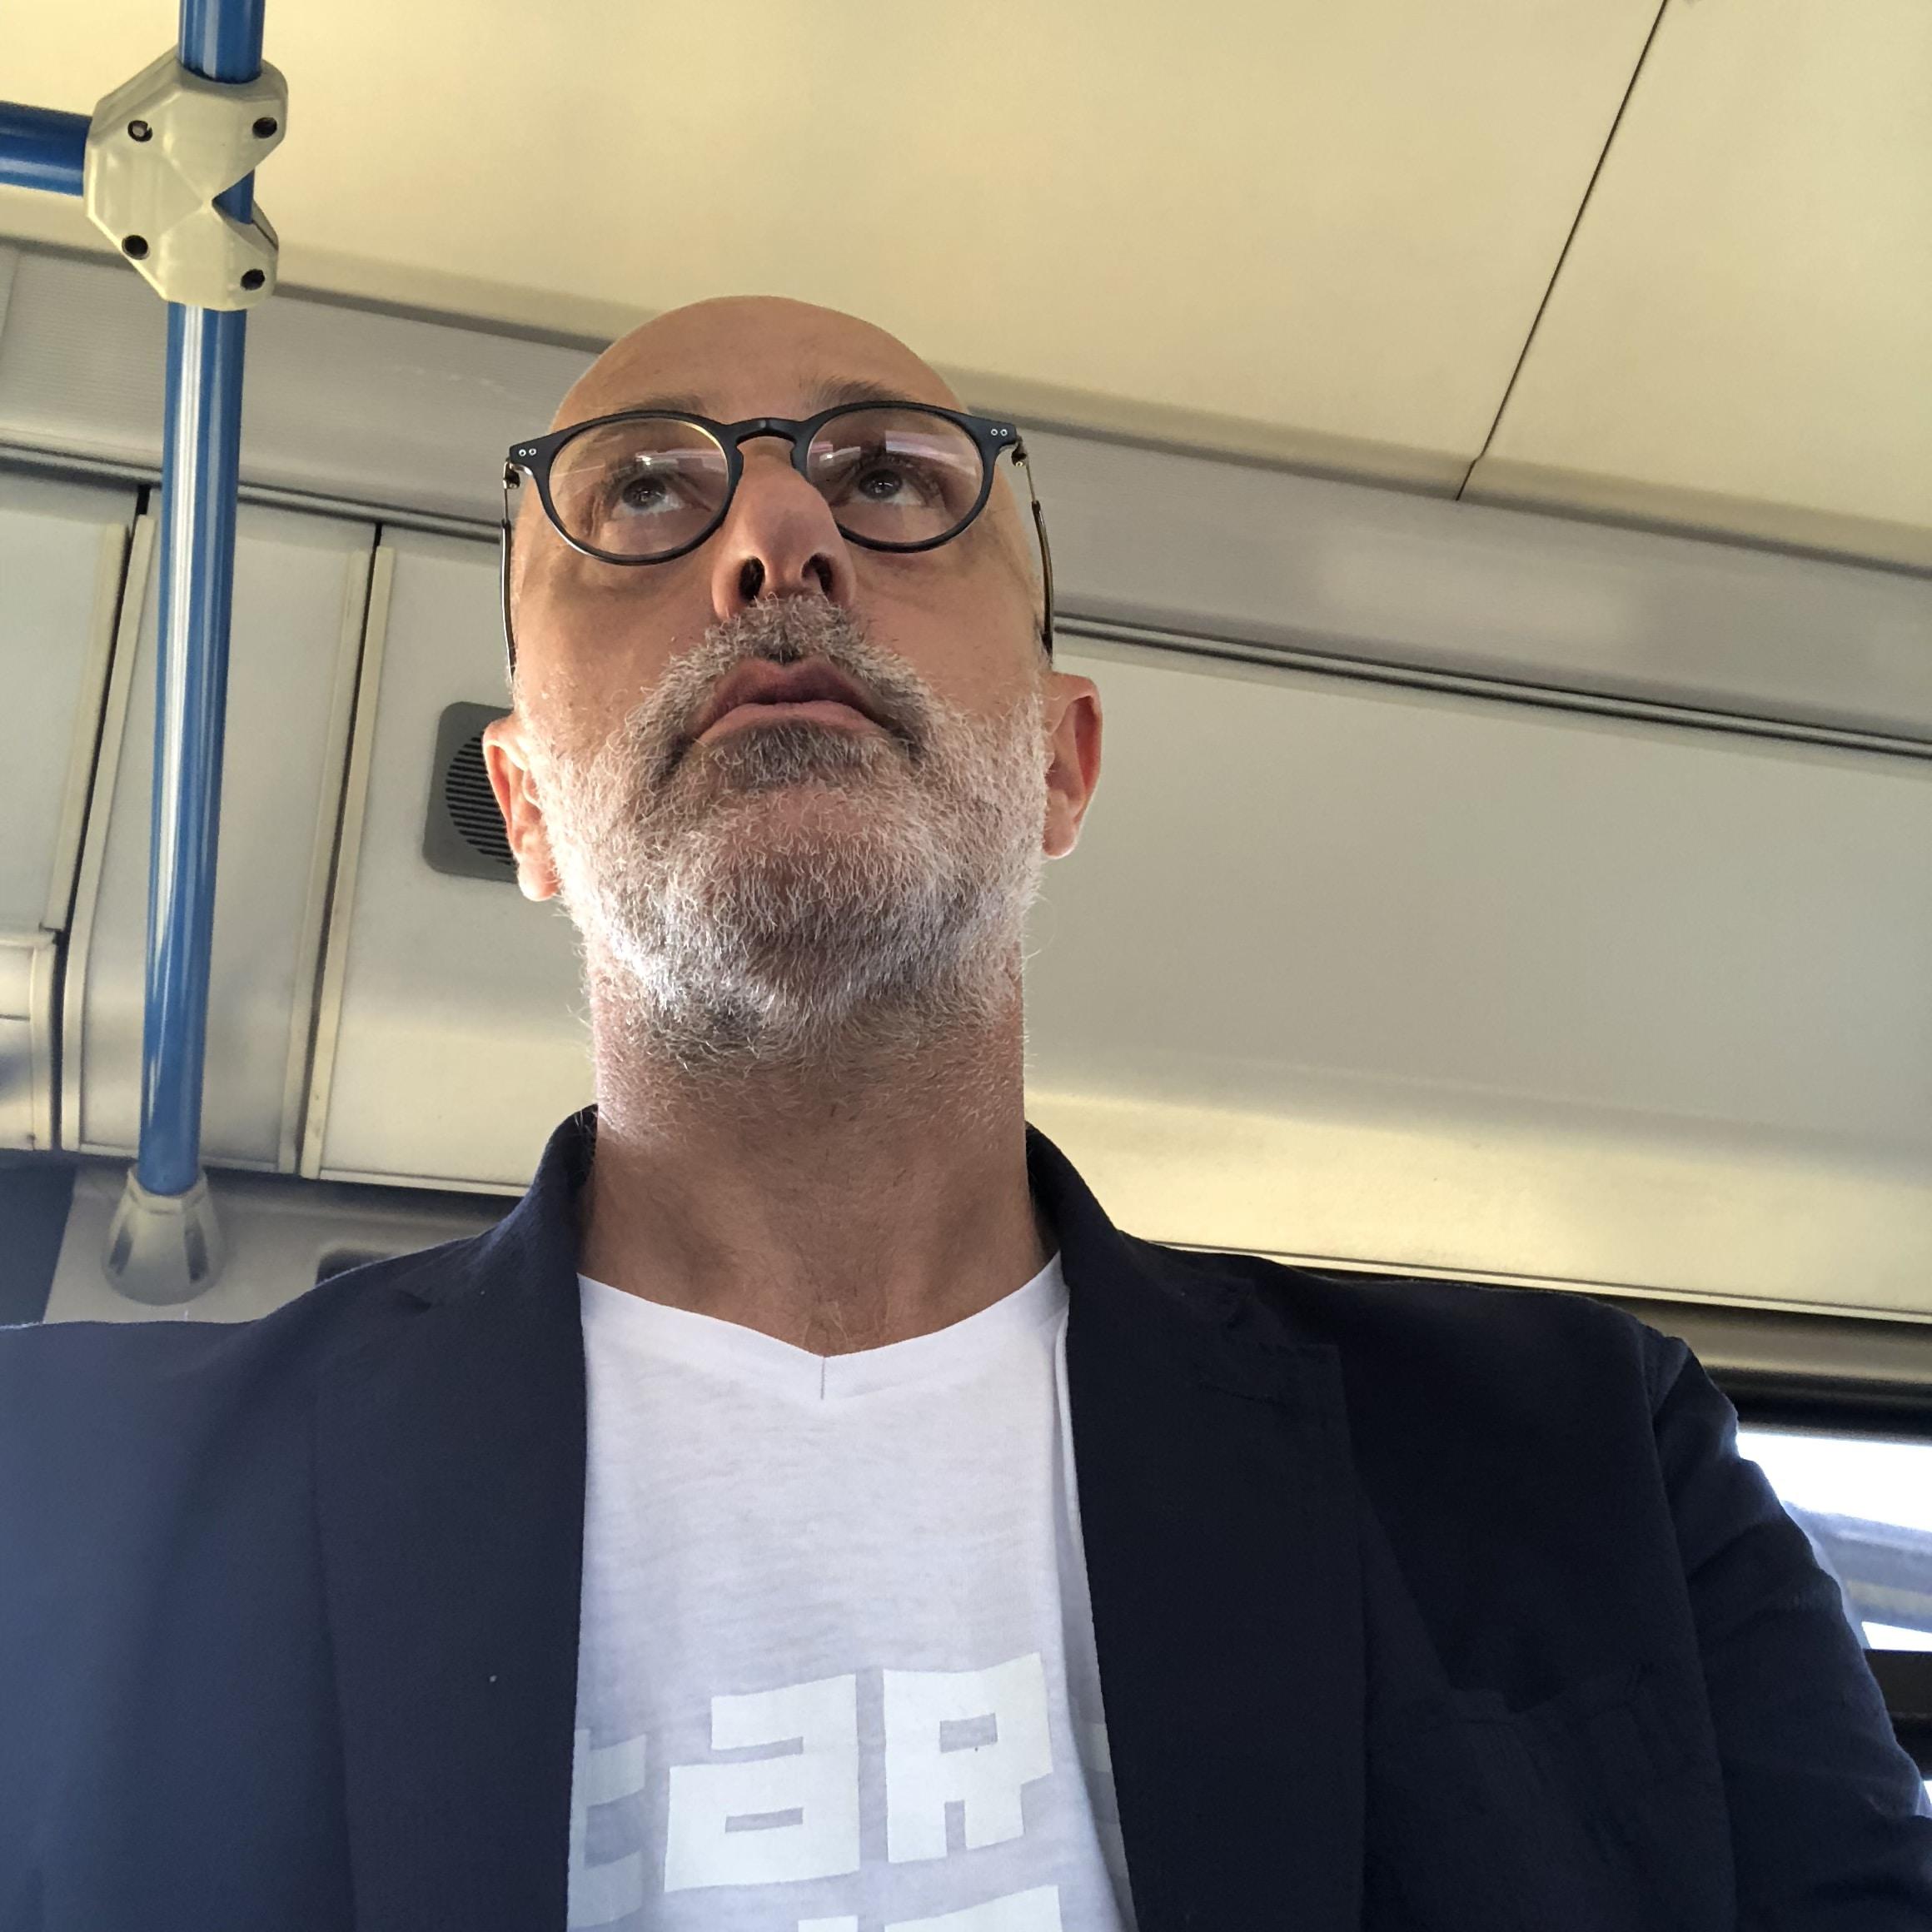 Avatar of user jacopo marello